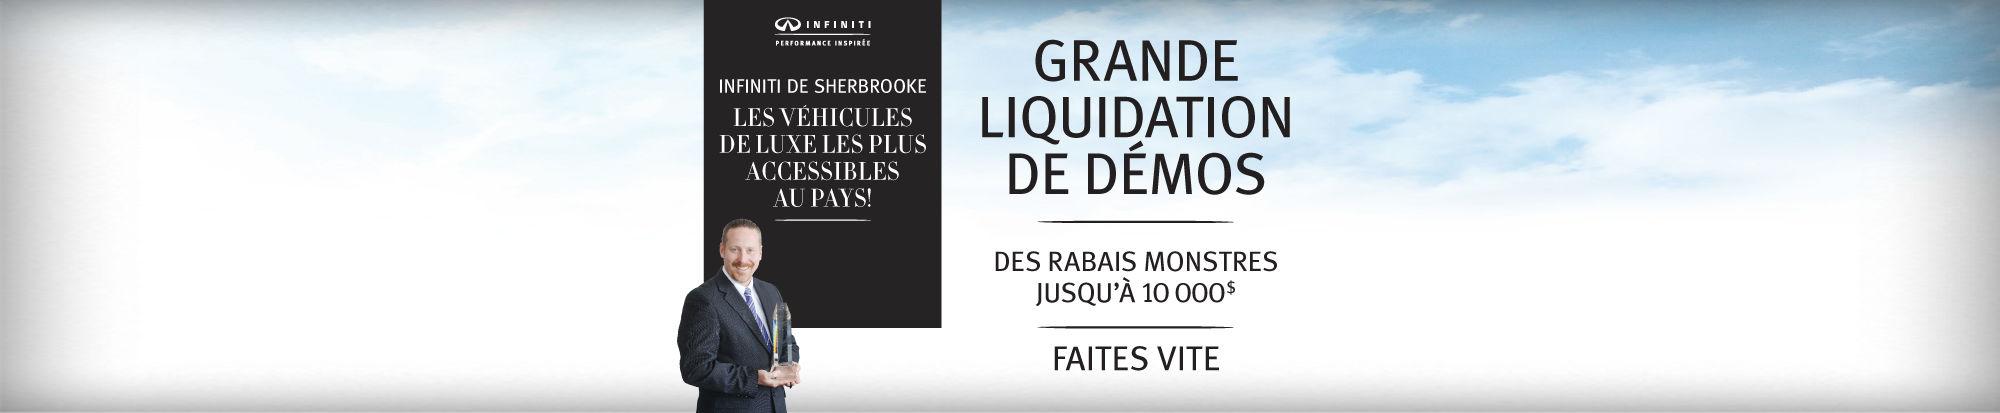 Grande liquidation de démos Octobre 2015